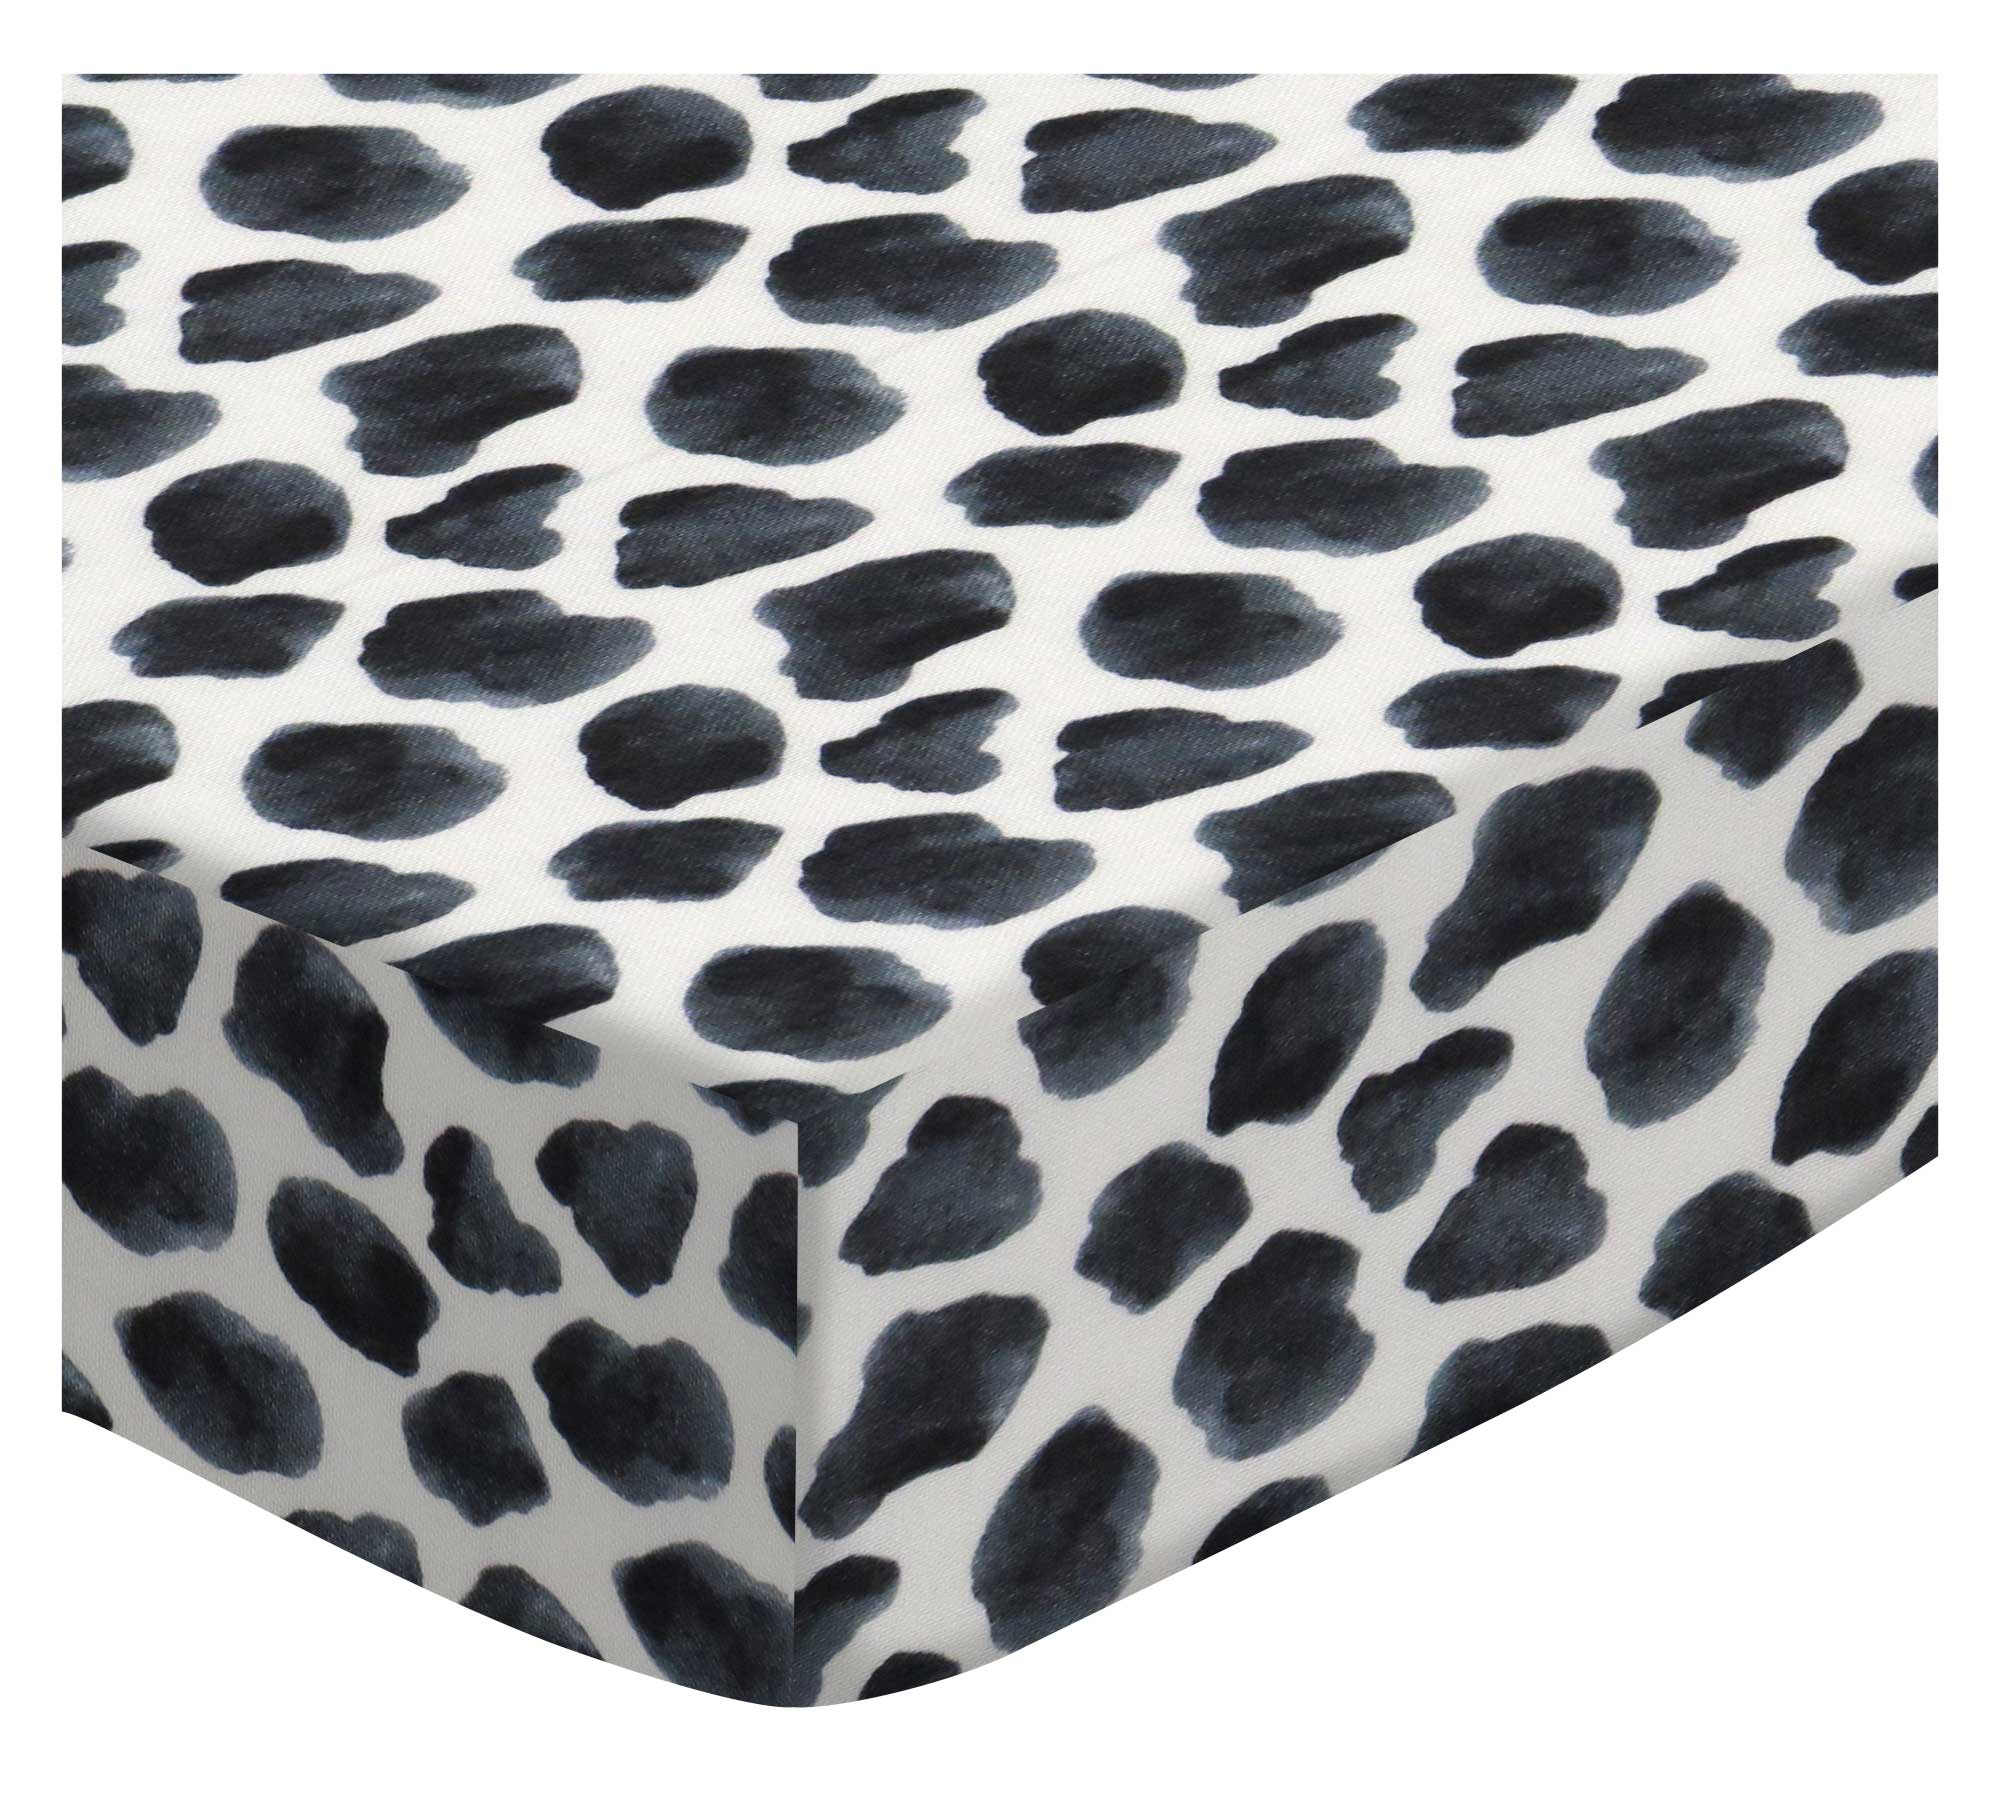 SheetWorld Crib Sheet Set - Black Cow Spots